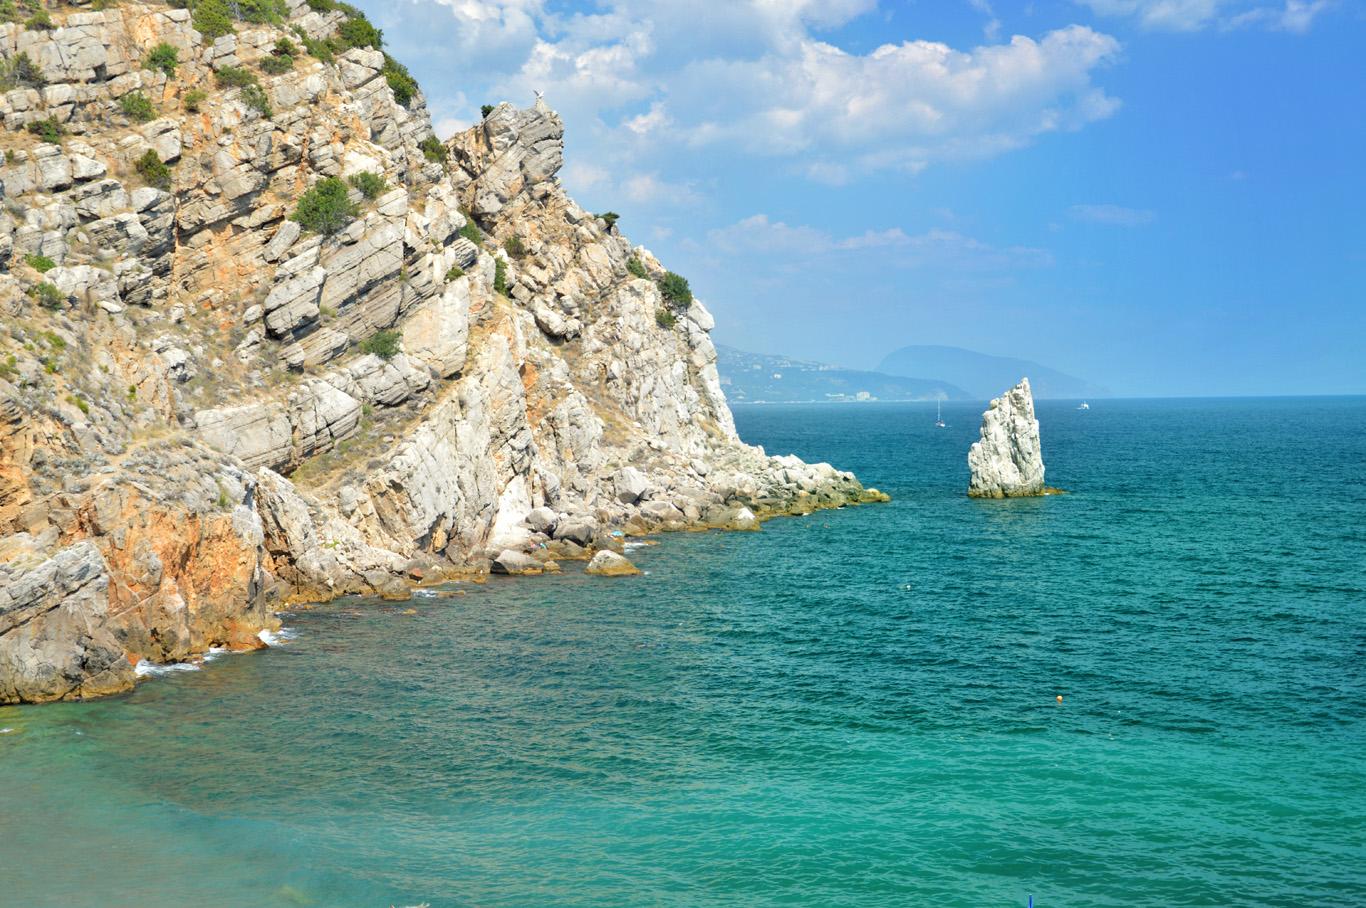 The coast and cliffs around